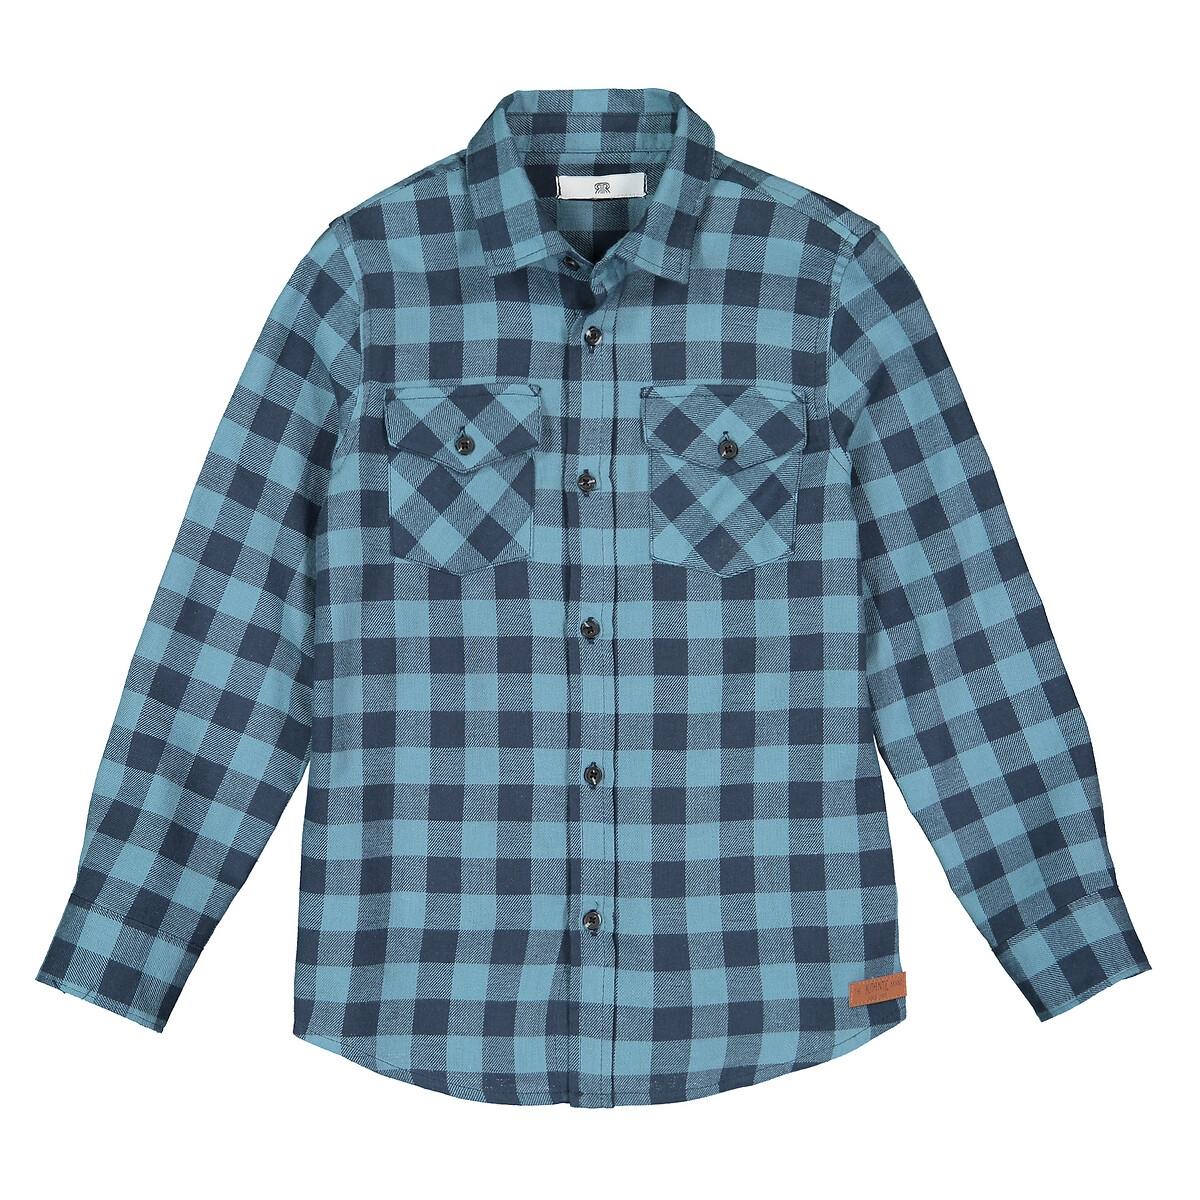 Cotton Checked Shirt 3 12 Years